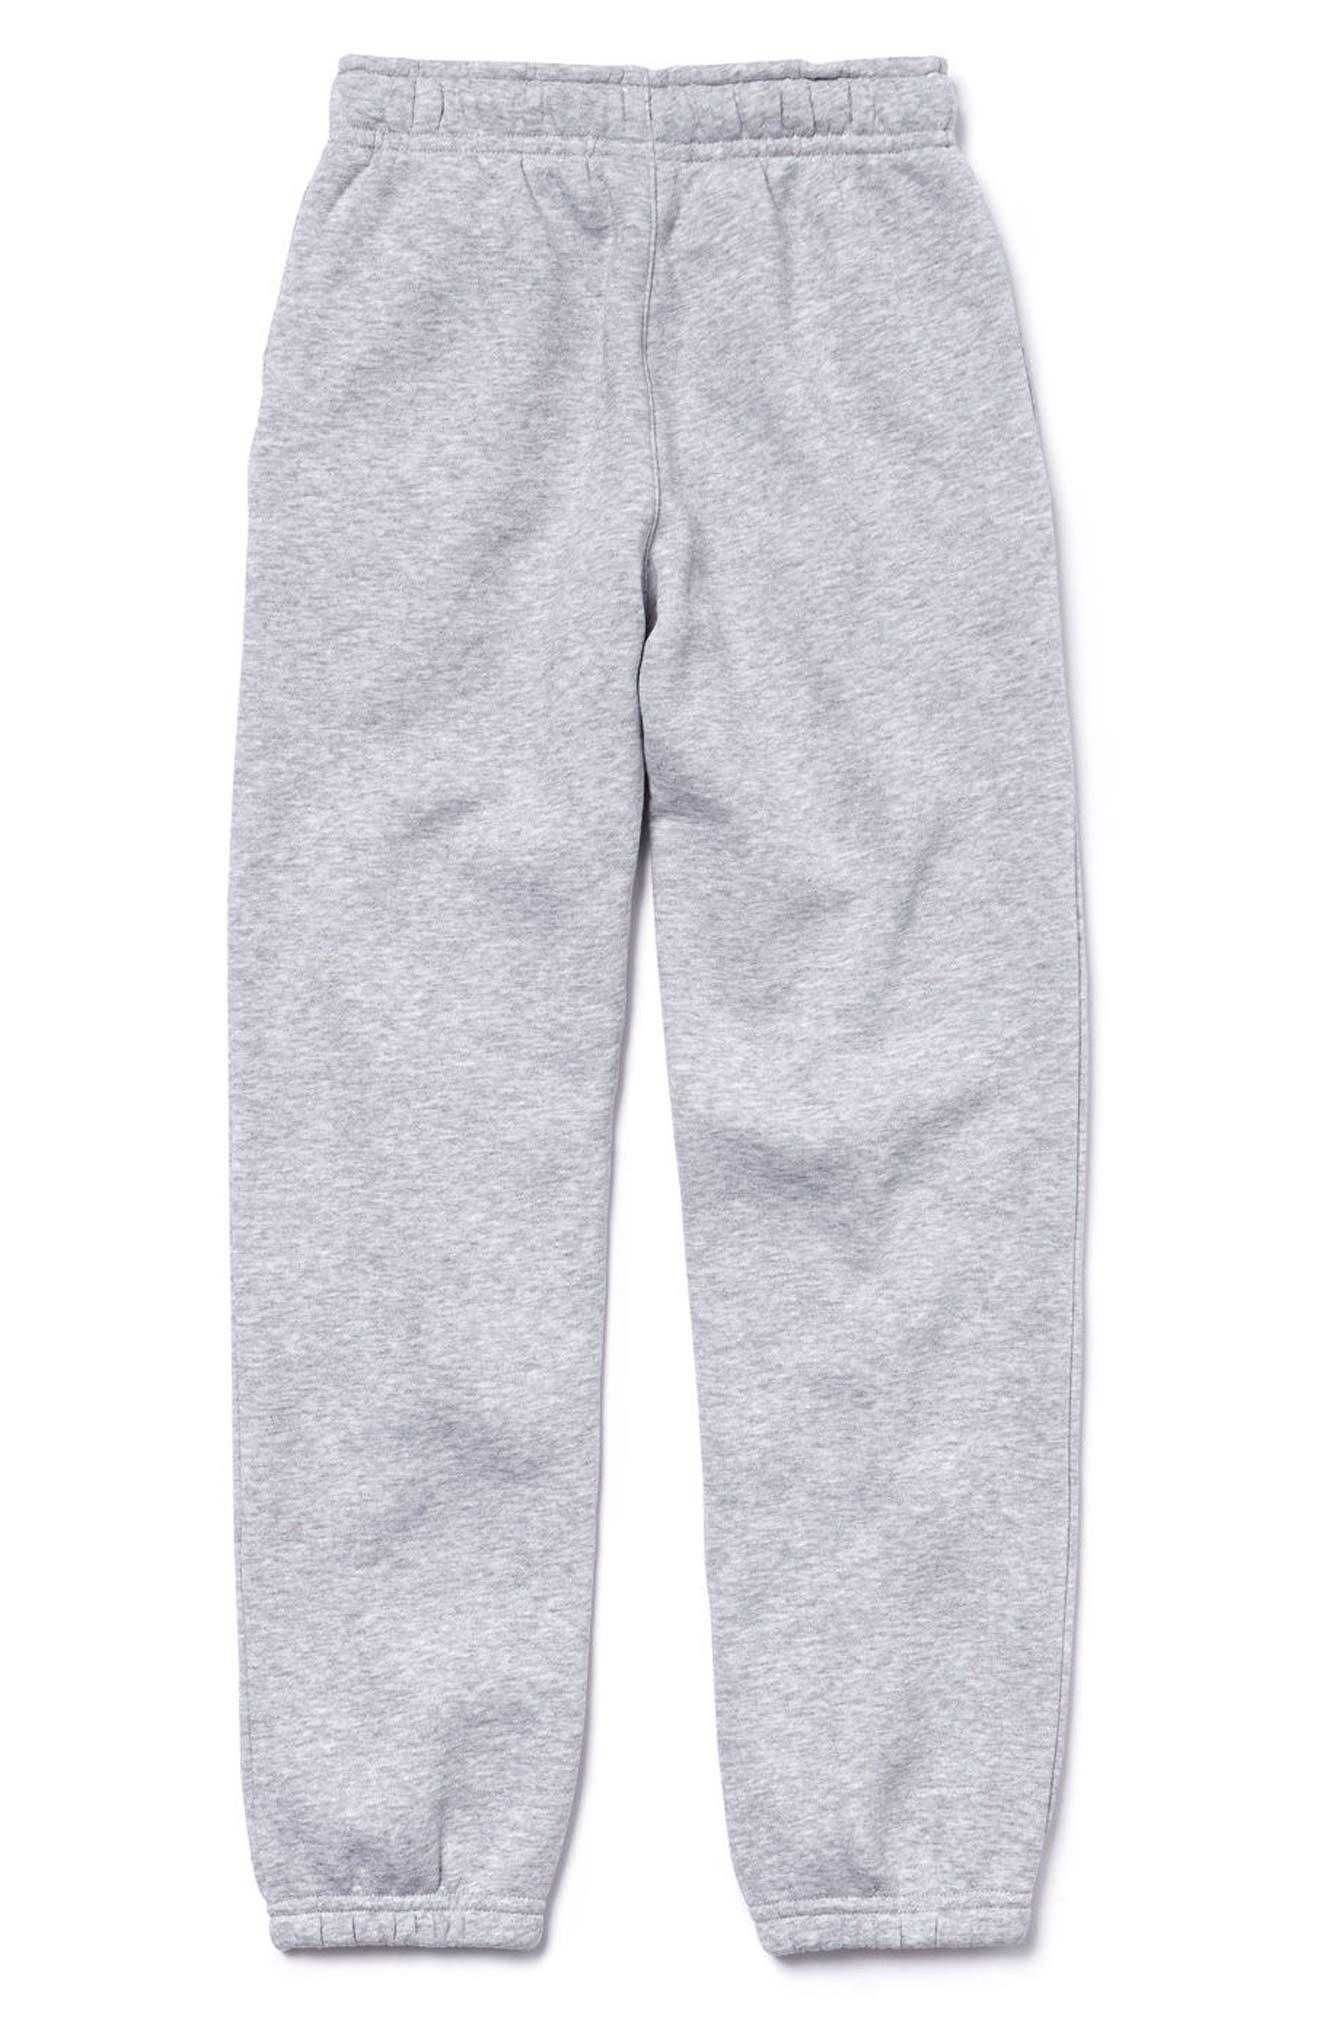 Sport Sweatpants,                             Alternate thumbnail 2, color,                             Silver Grey Chine